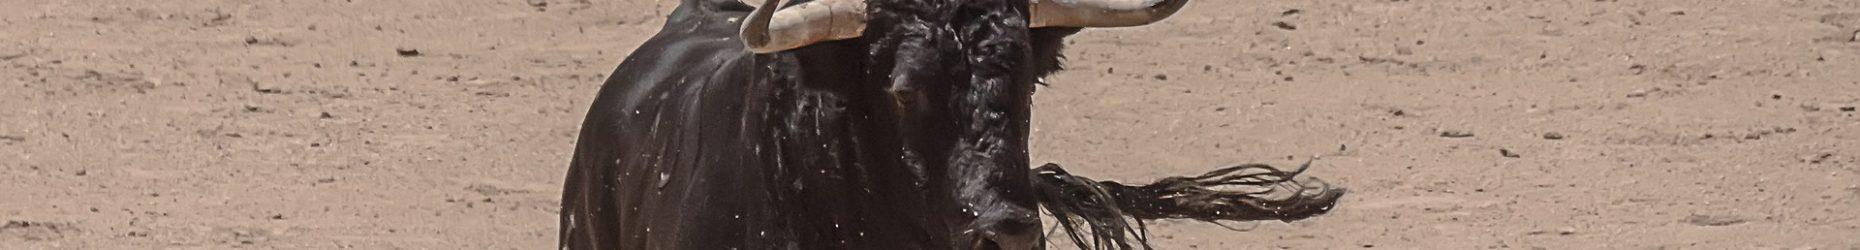 taureau et matador